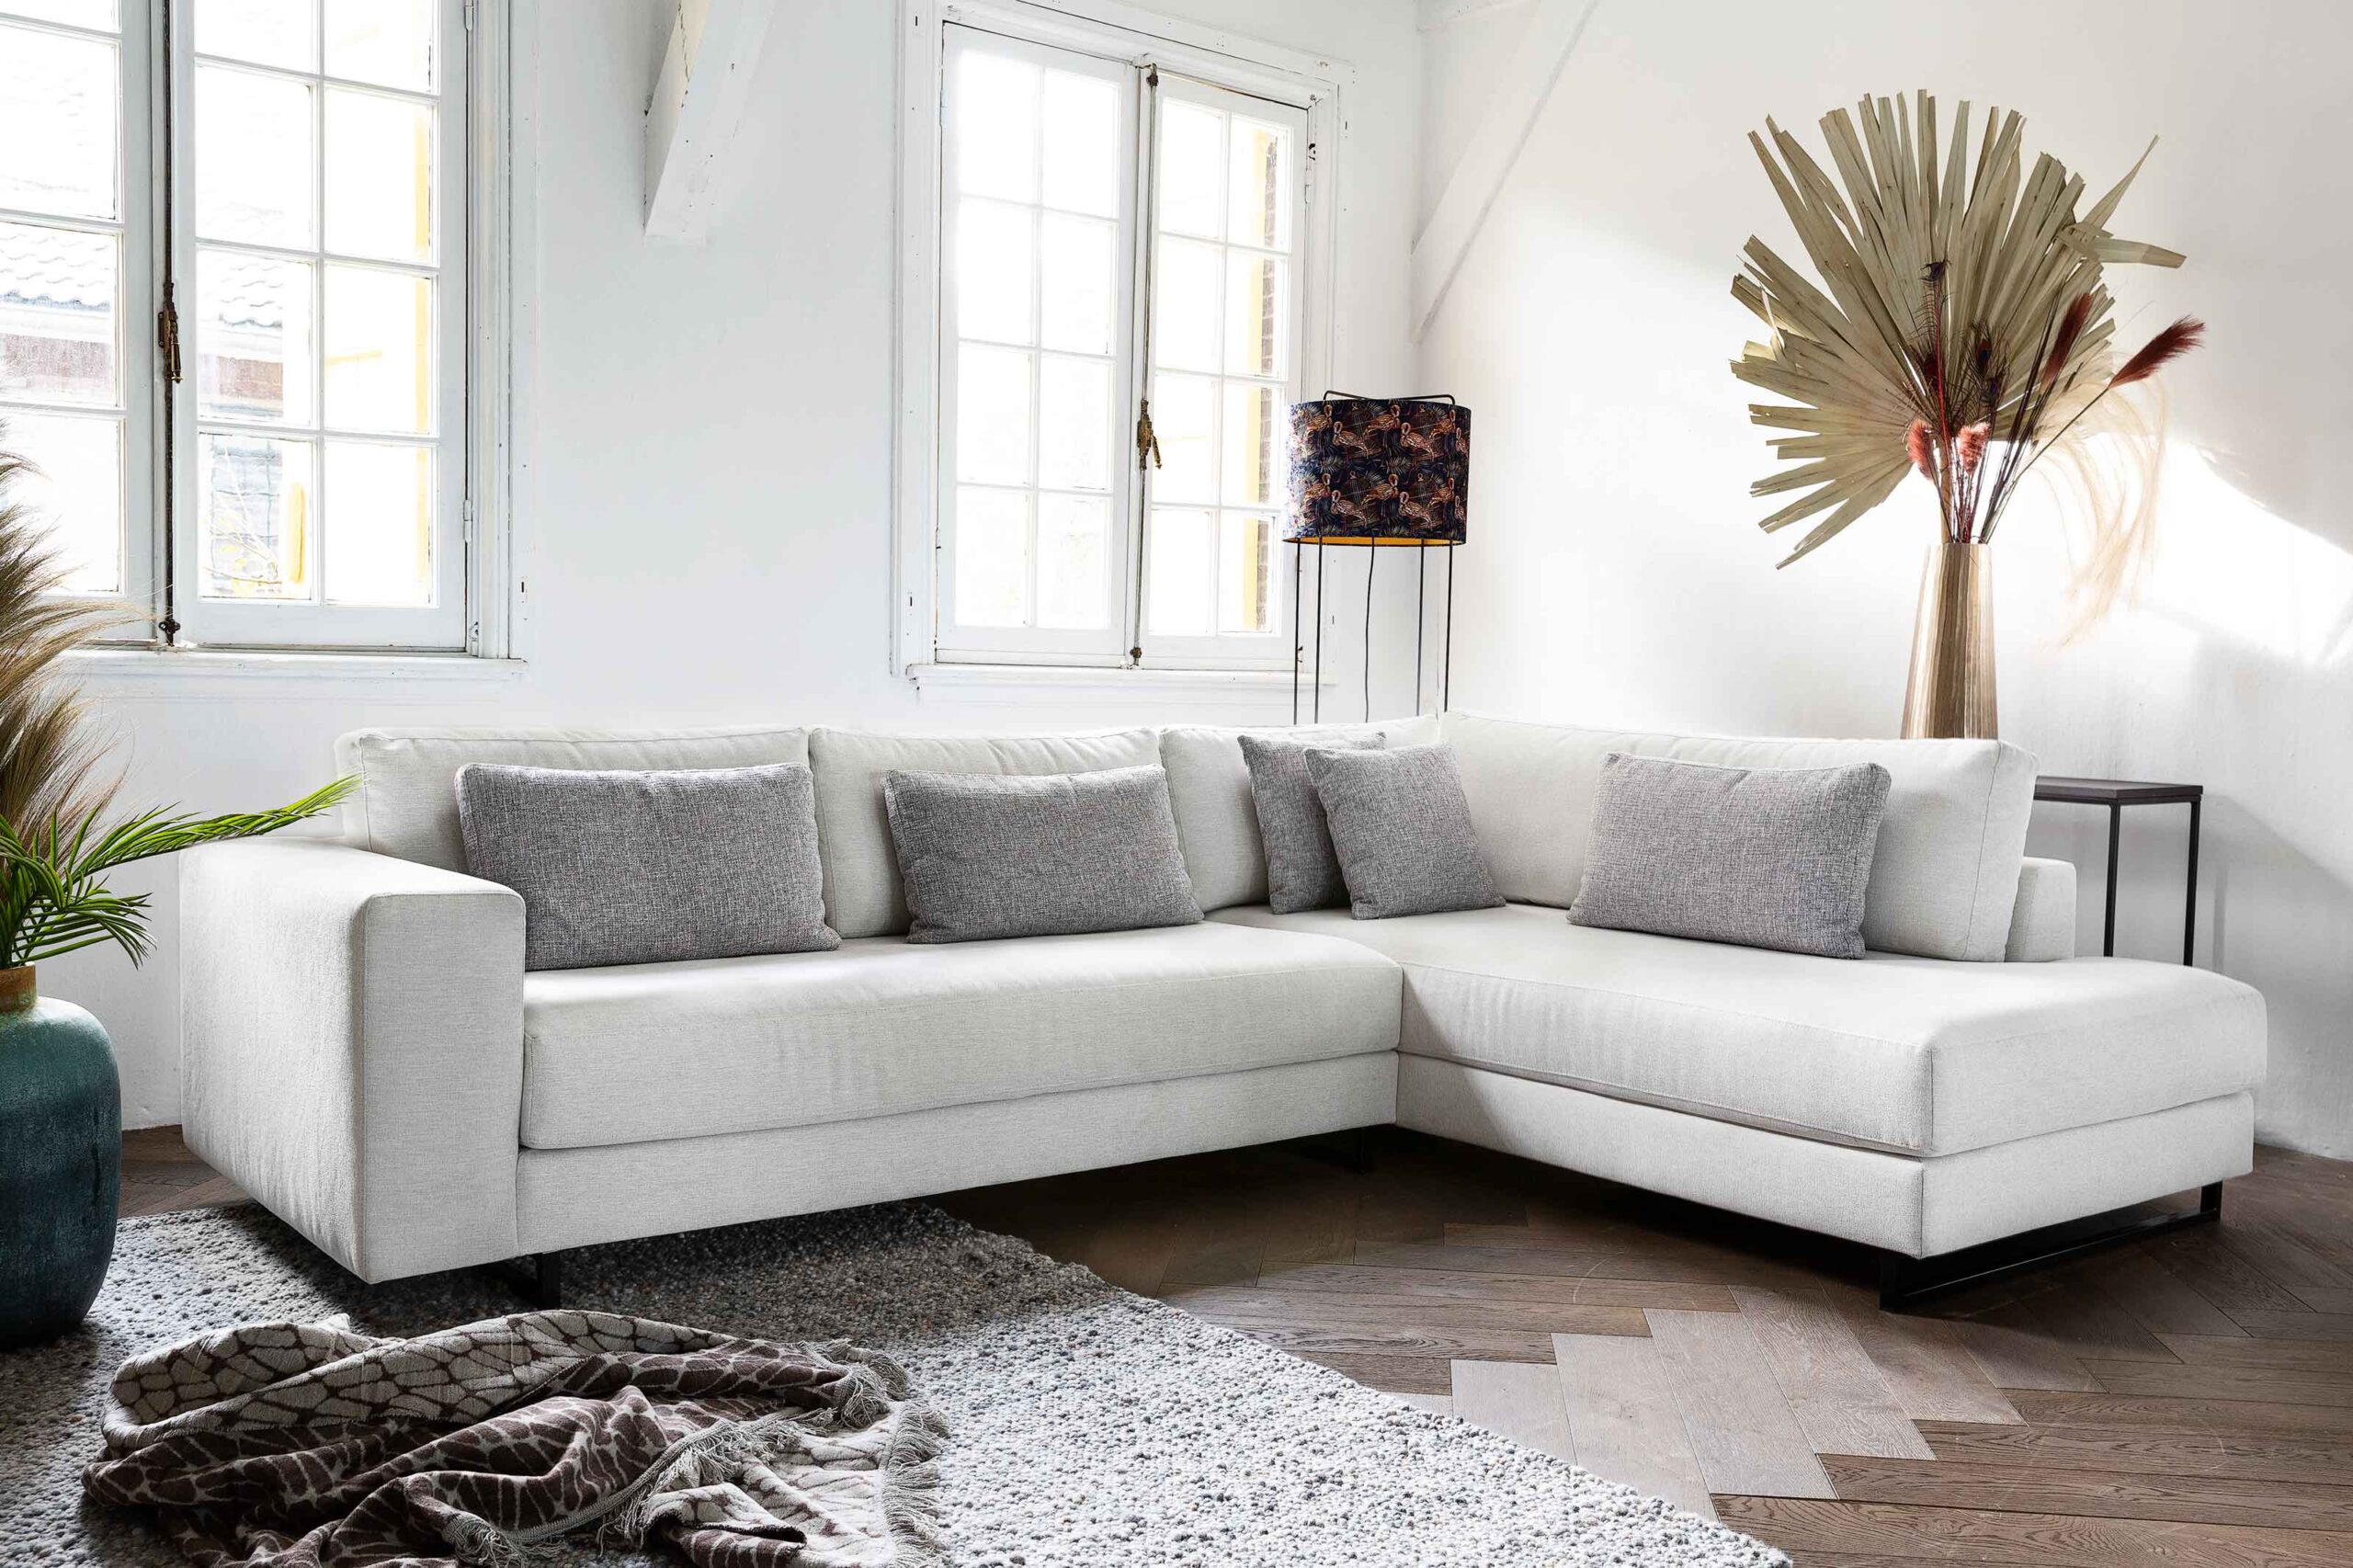 sunny-ibiza-hoekbank-ottoman-dubbele-kussens-af-fabriek-ottoman-soofs-interieur